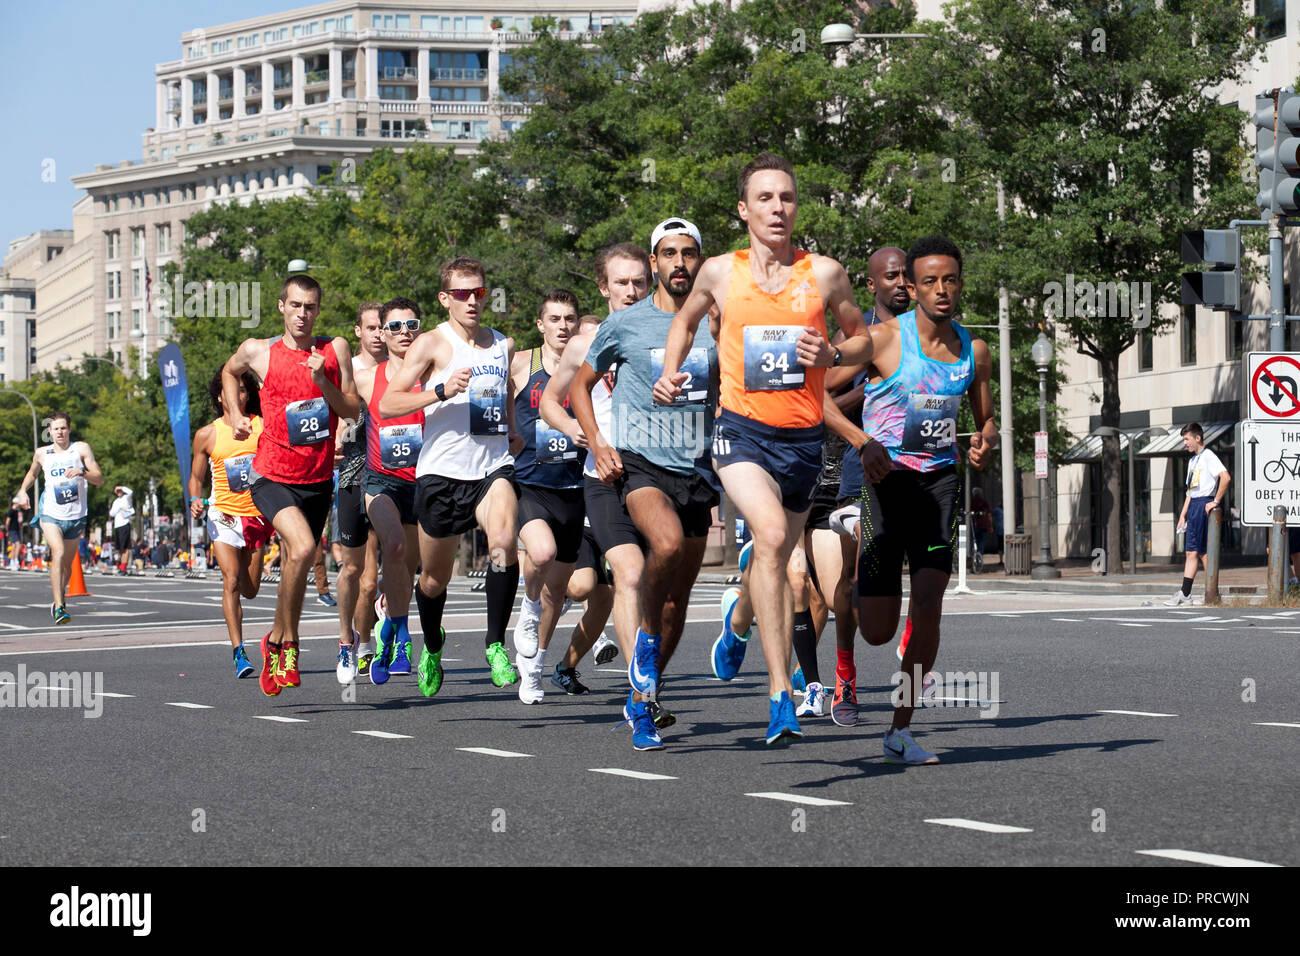 Race runners at Navy Mile - Washington, DC USA - Stock Image